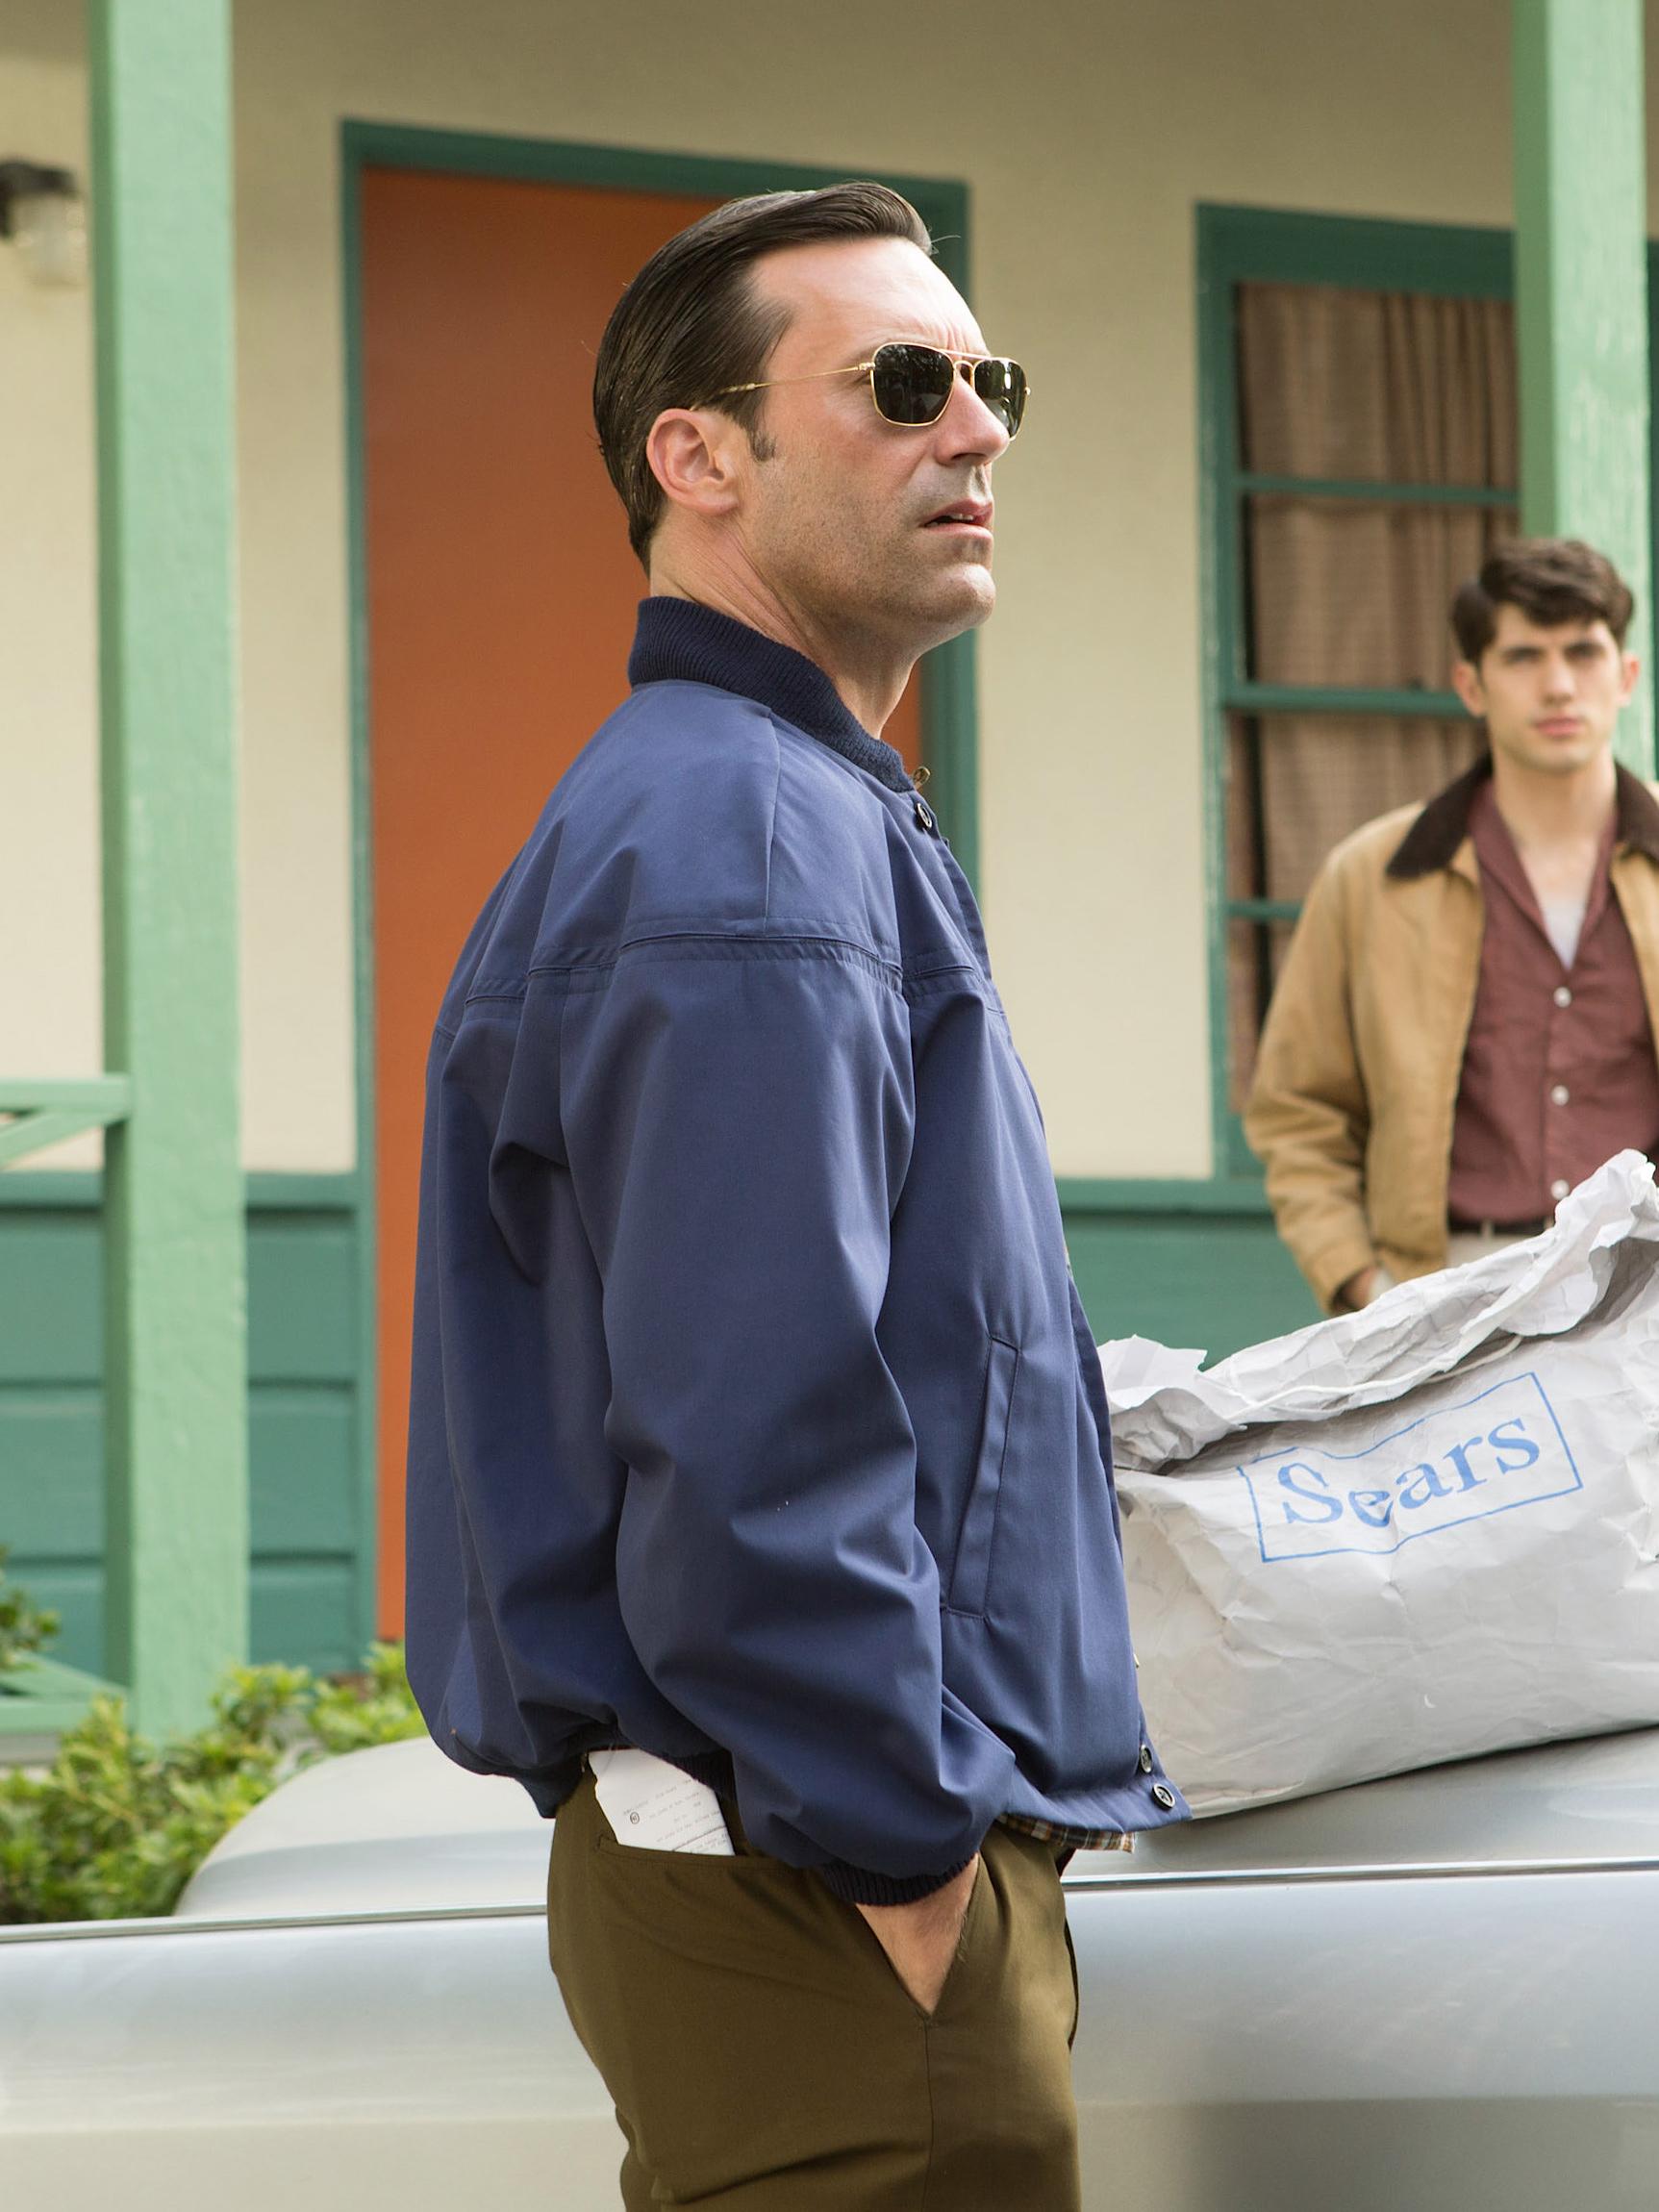 0d62b71ed46 Jon Hamm as Don Draper on Mad Men (Episode 7.13